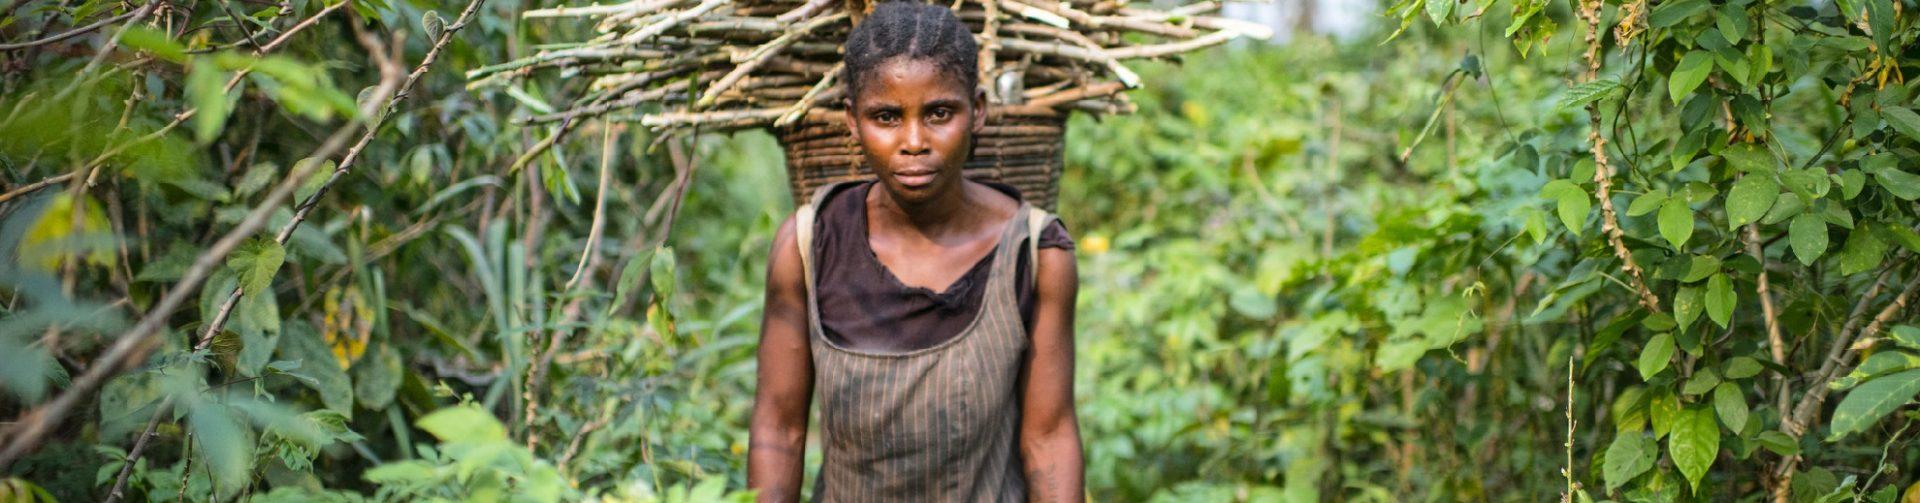 Why gender matters in forest restoration